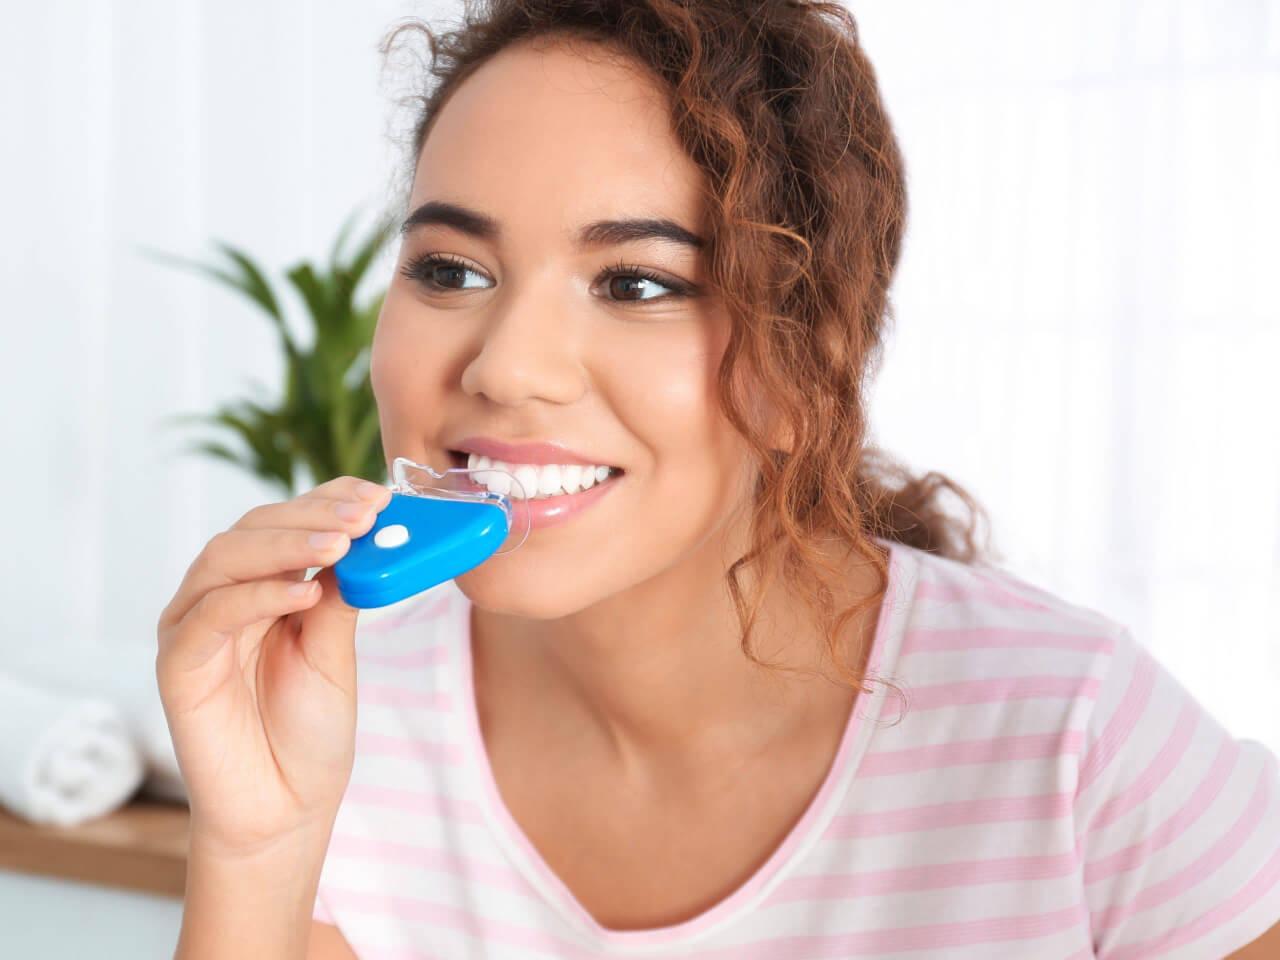 migliore-kit-sbiancamento-denti-led